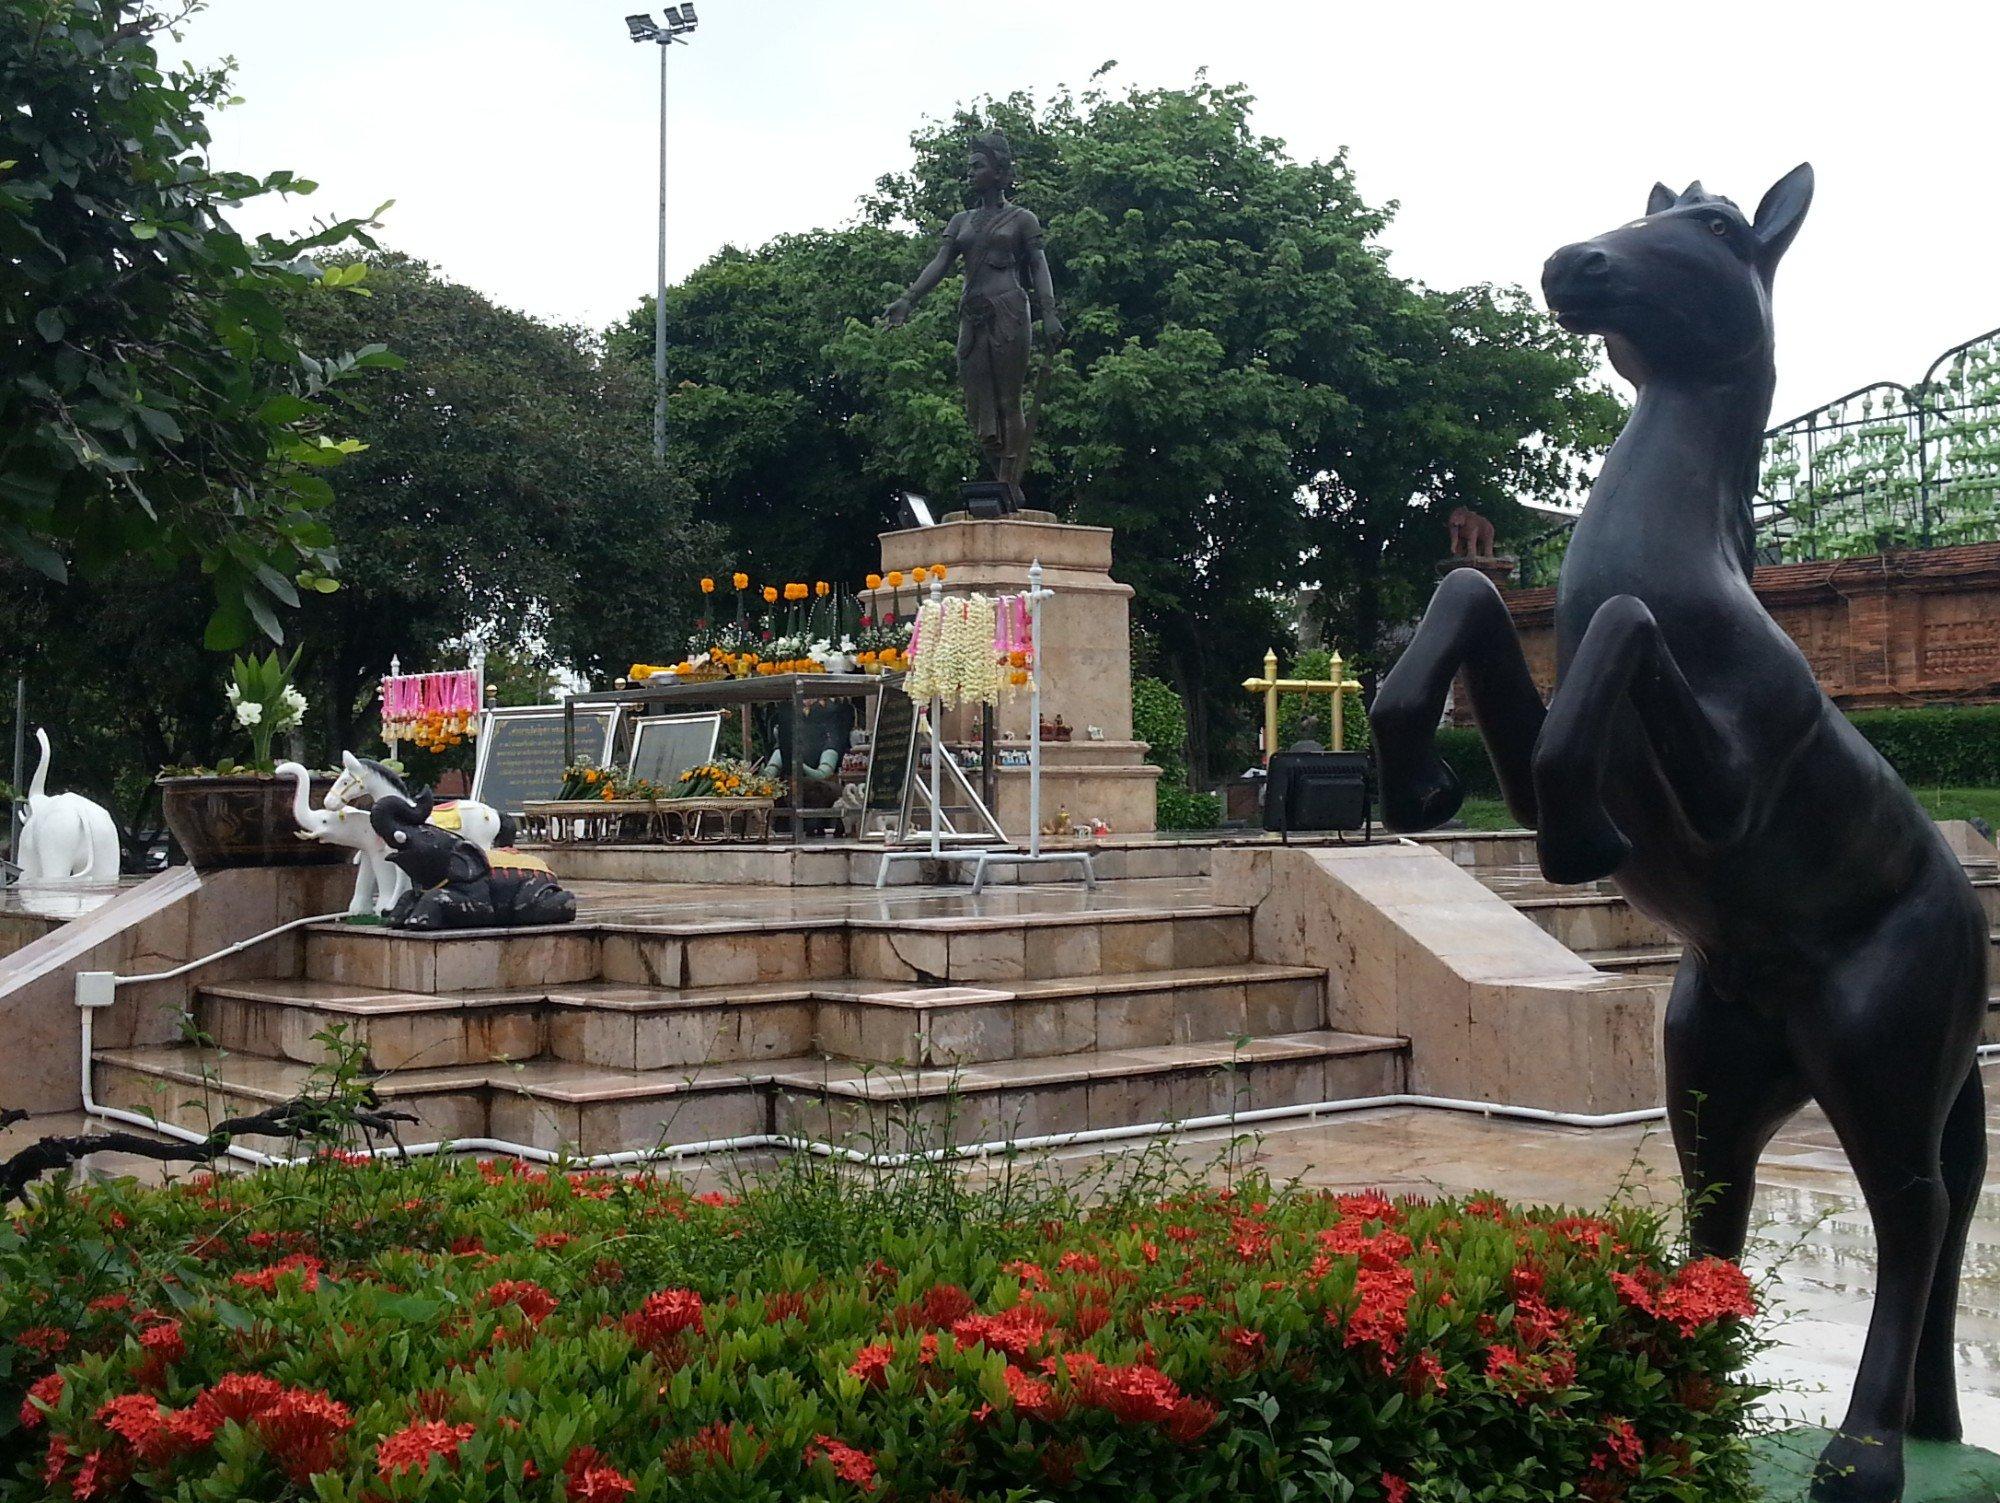 Phra Nang Chamathewi Monument in Lamphun